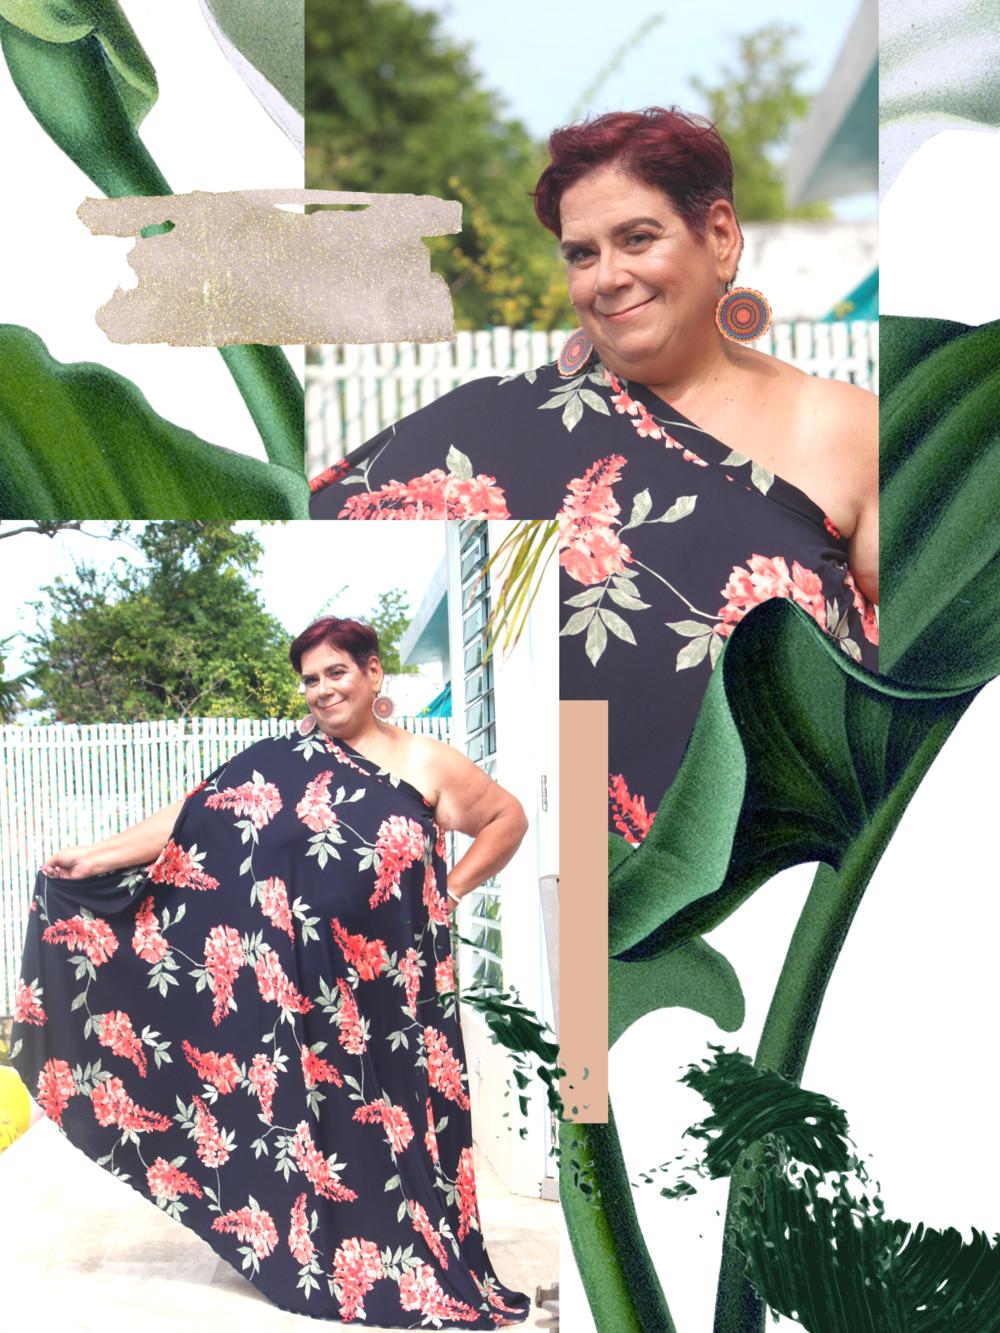 Audrey - Mamá de Alana - Francisca + Boutique |  Happiluk  | Kleüre Cosmetics |  Makeup by Beth